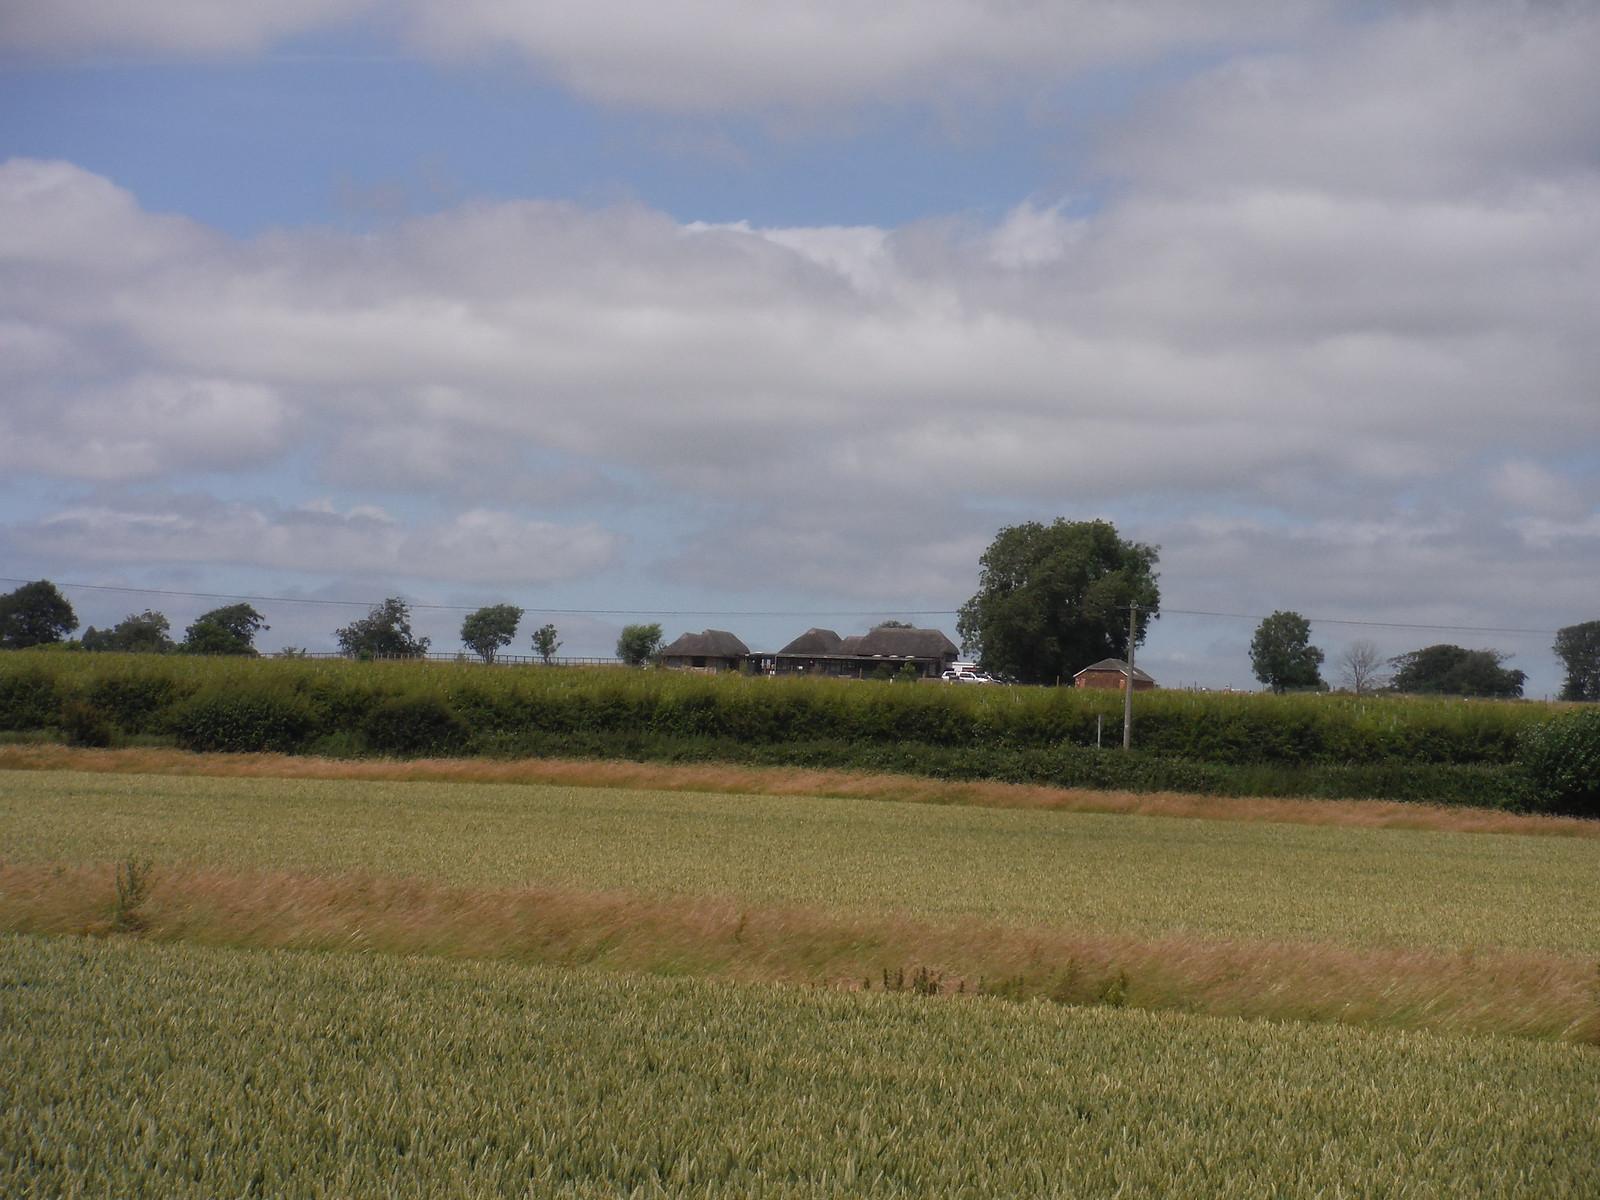 Bignor Roman Villa across a field and a road SWC Walk 217 Midhurst Way: Arundel to Midhurst